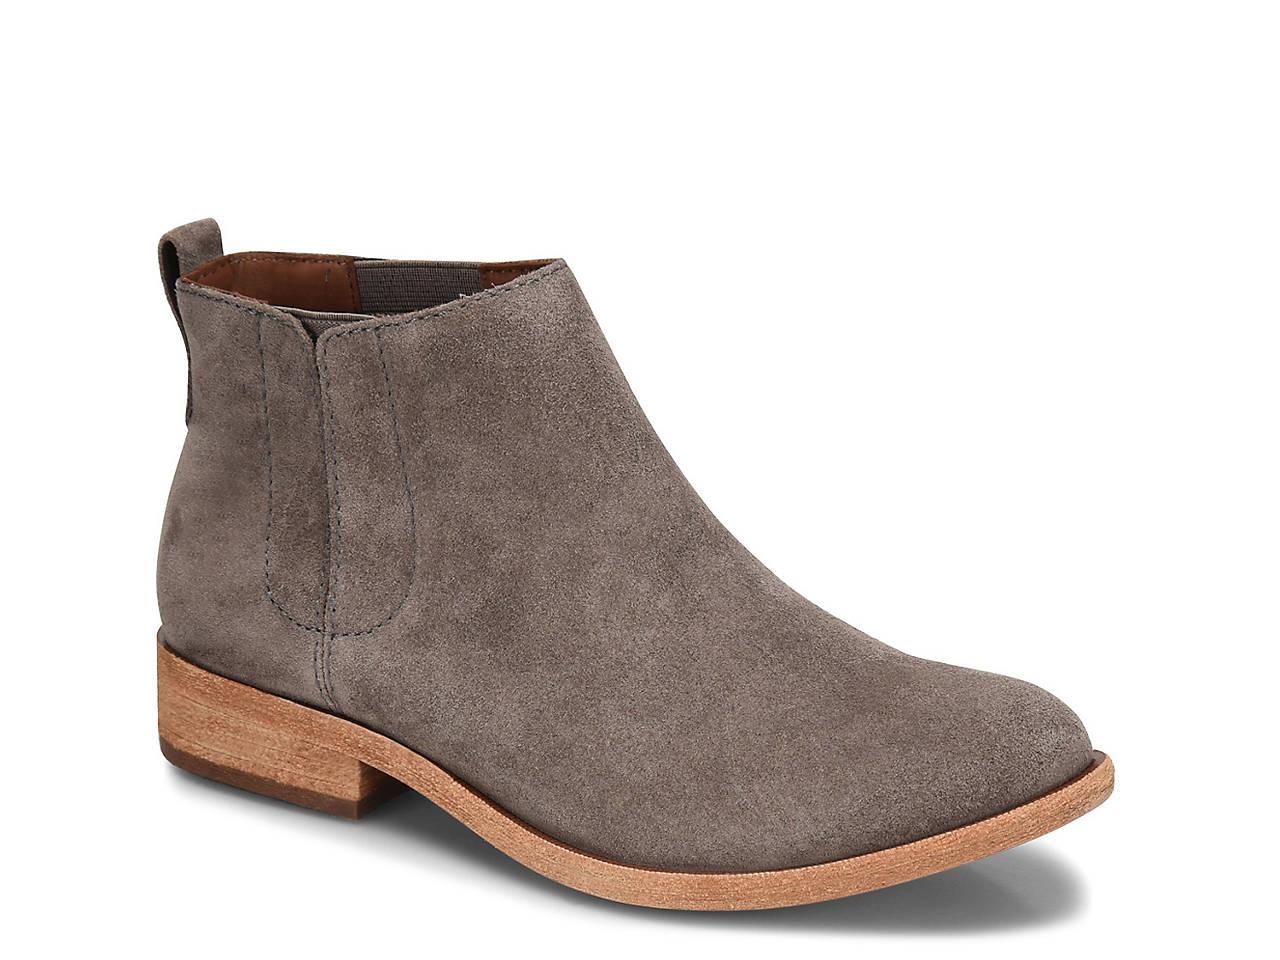 08f196d8f09 Kork-Ease Velma Bootie Women s Shoes